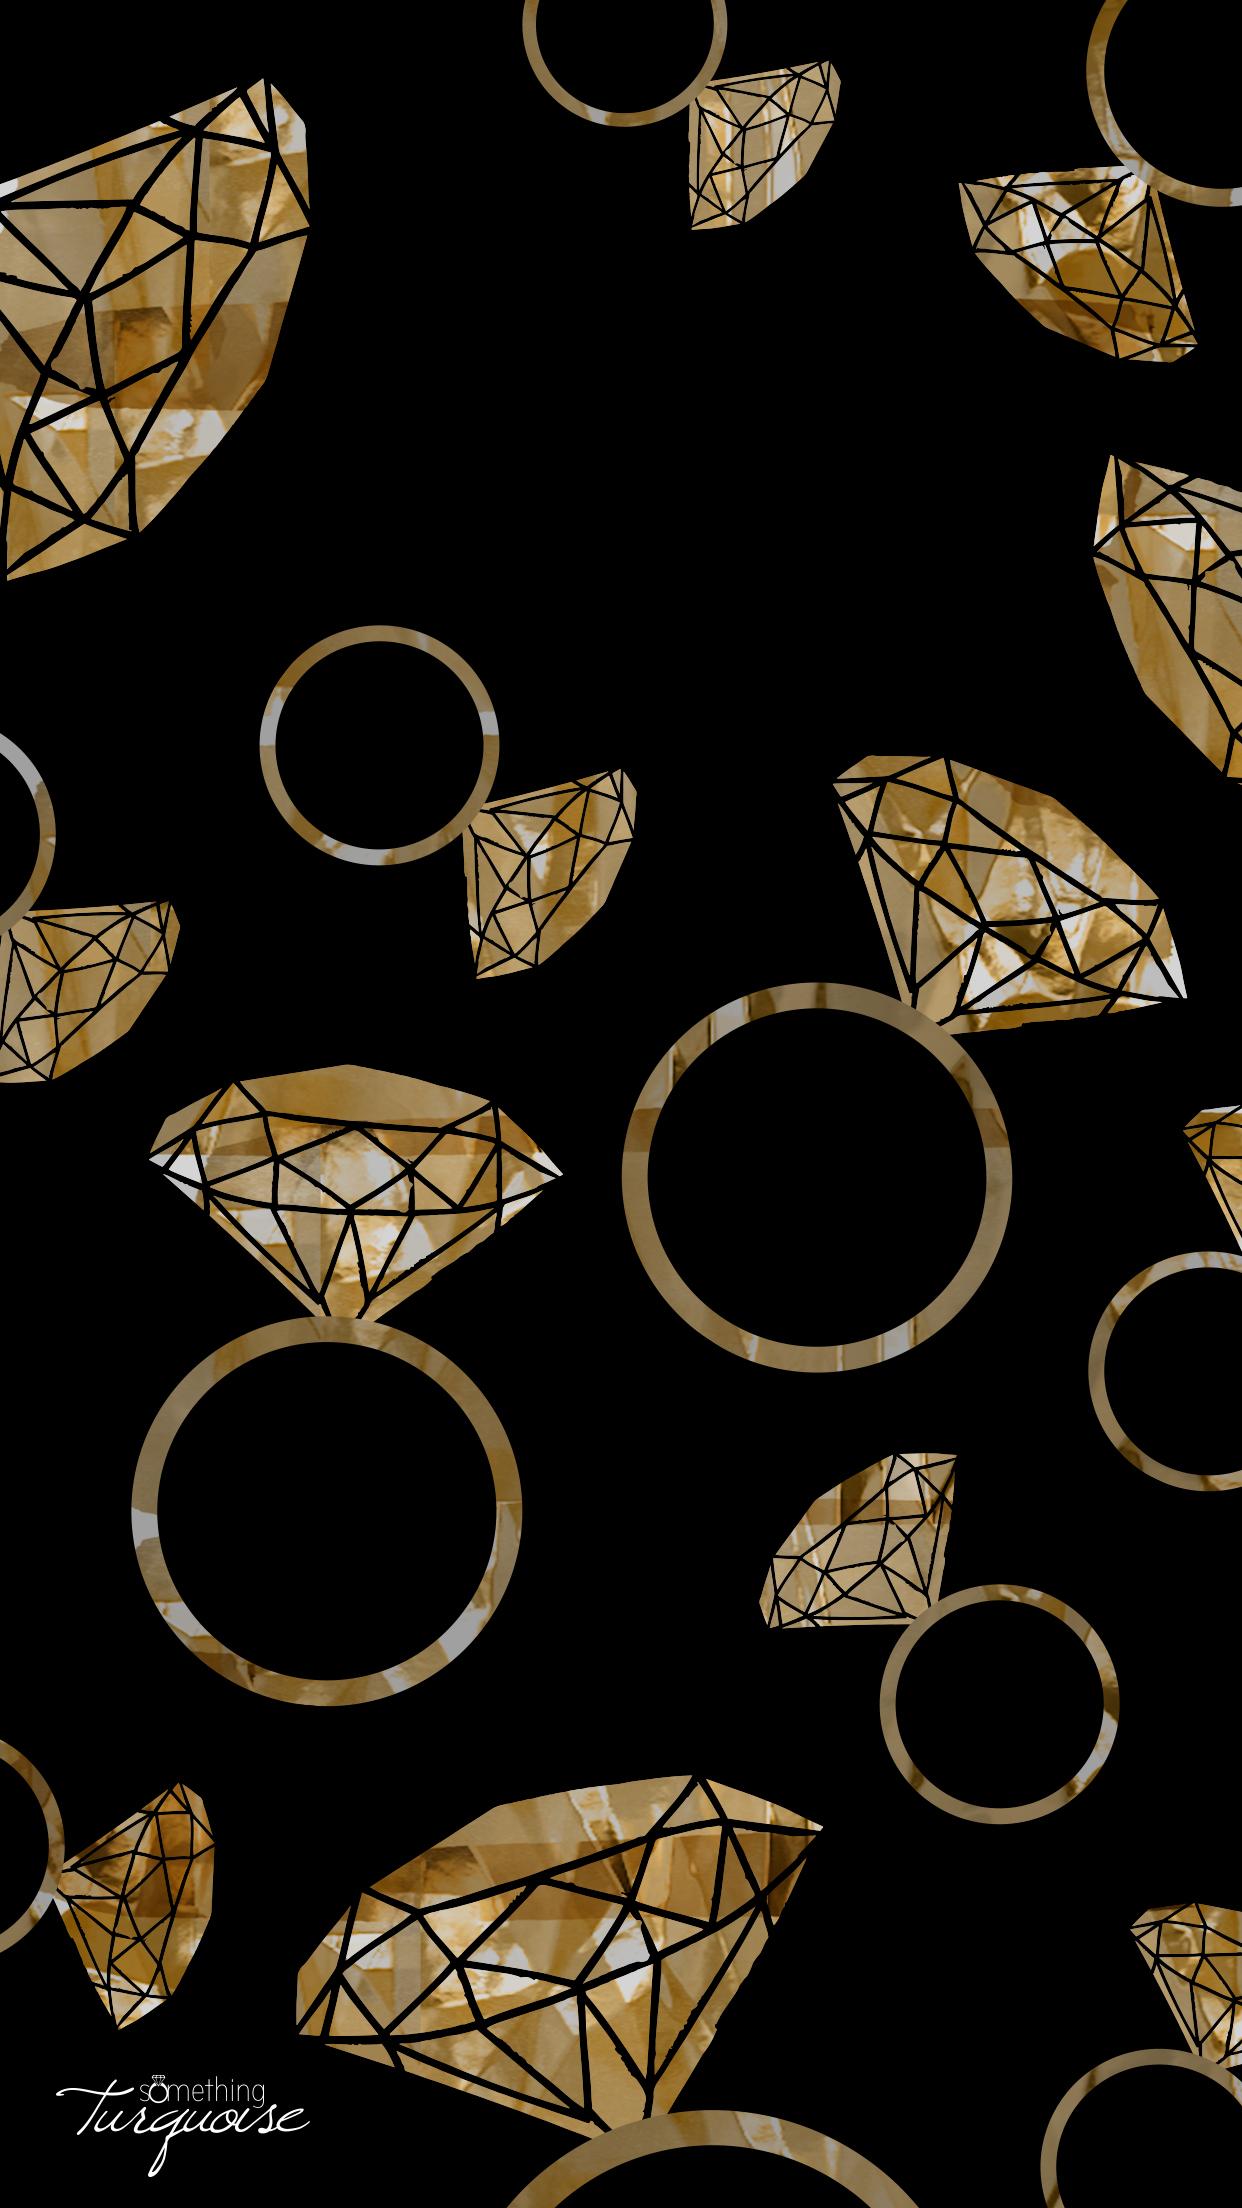 FREE gold diamond ring iPhone wallpaper!